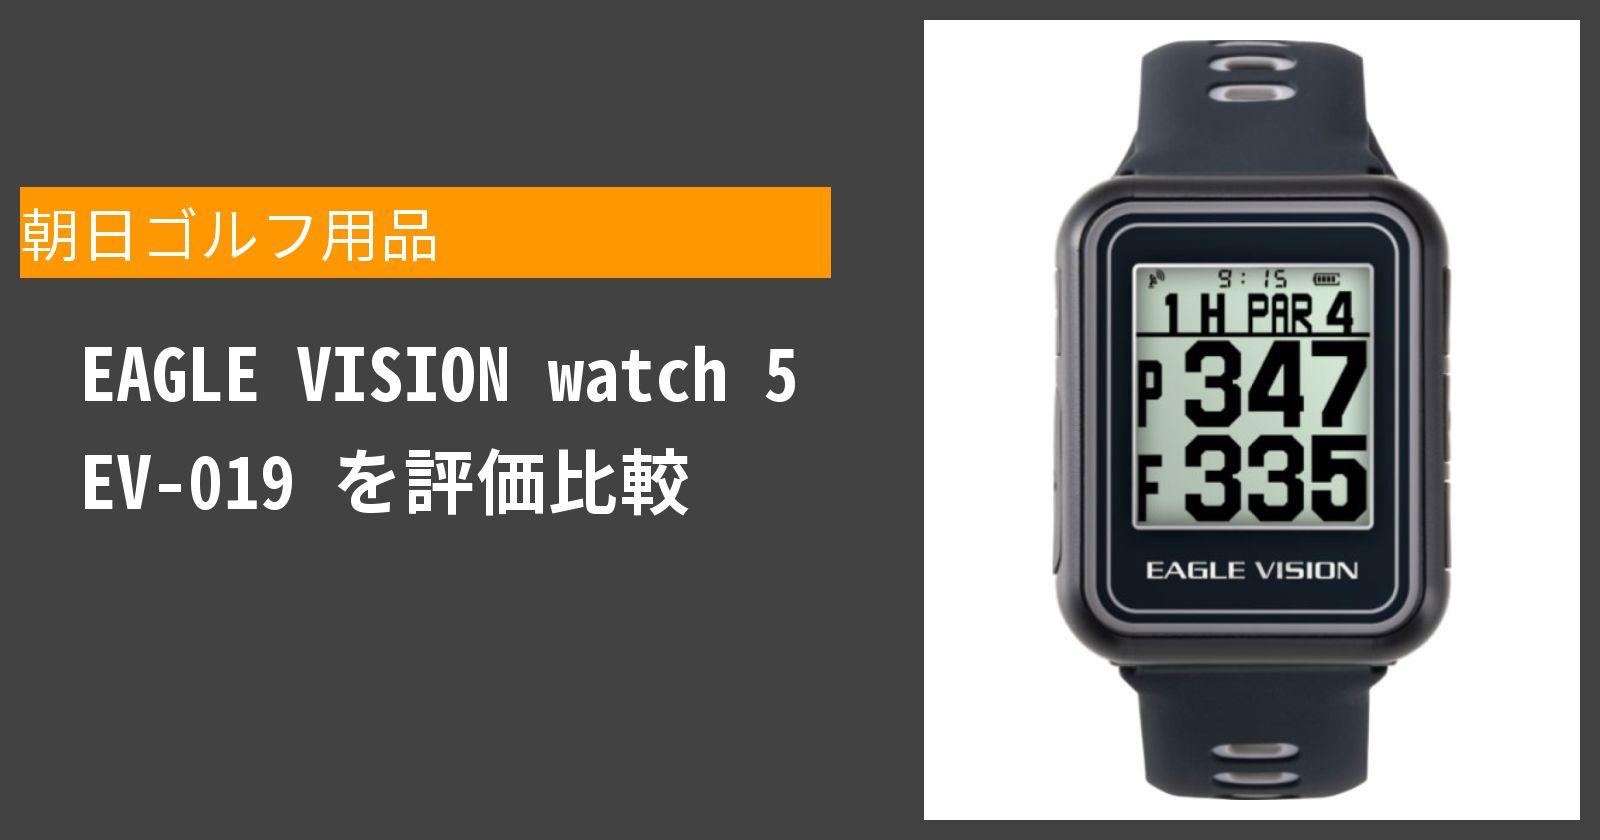 EAGLE VISION watch 5 EV-019を徹底評価